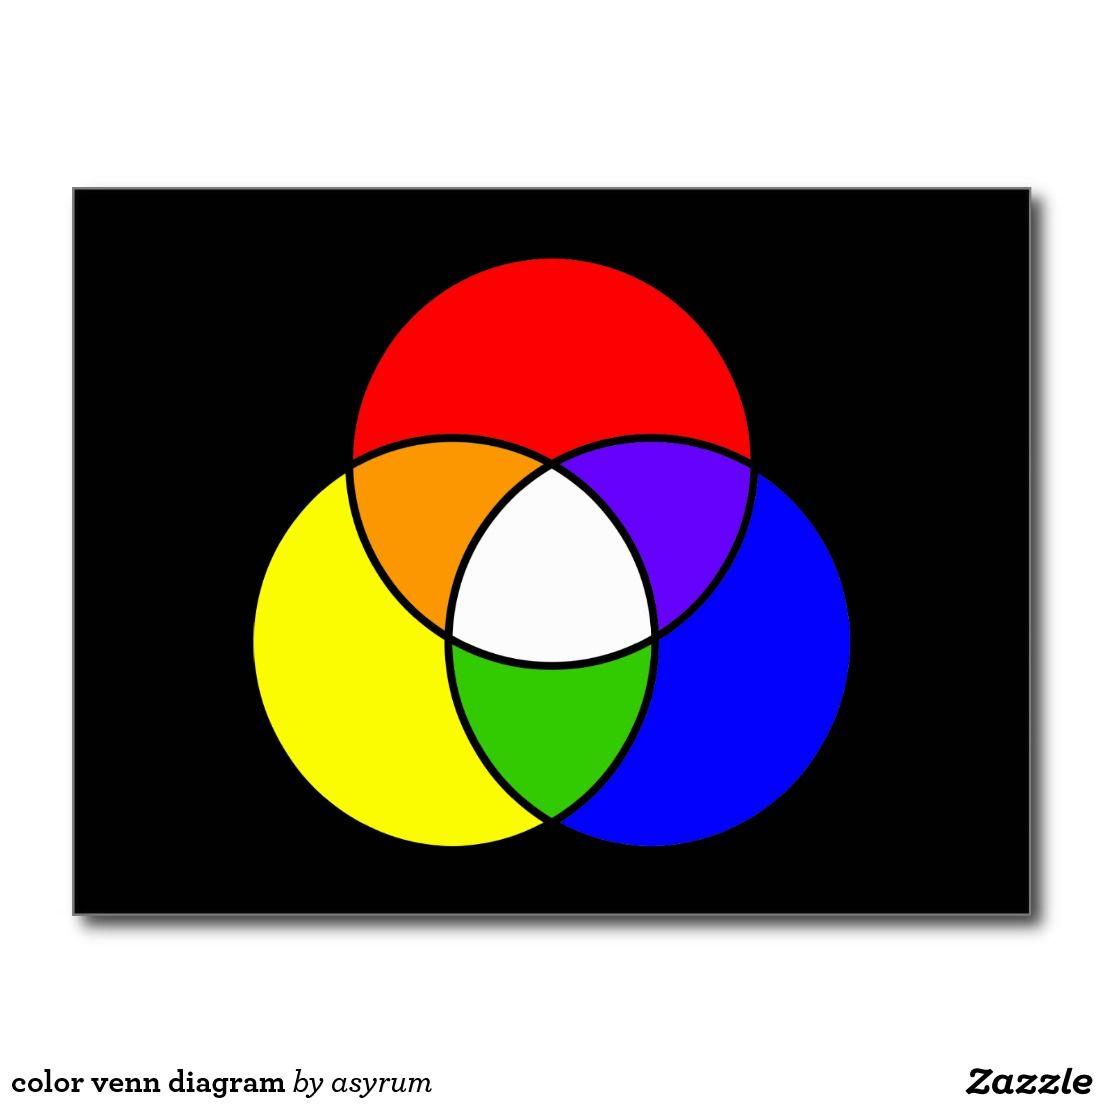 Color venn diagram postcard venn diagrams and diagram color venn diagram postcard pooptronica Choice Image